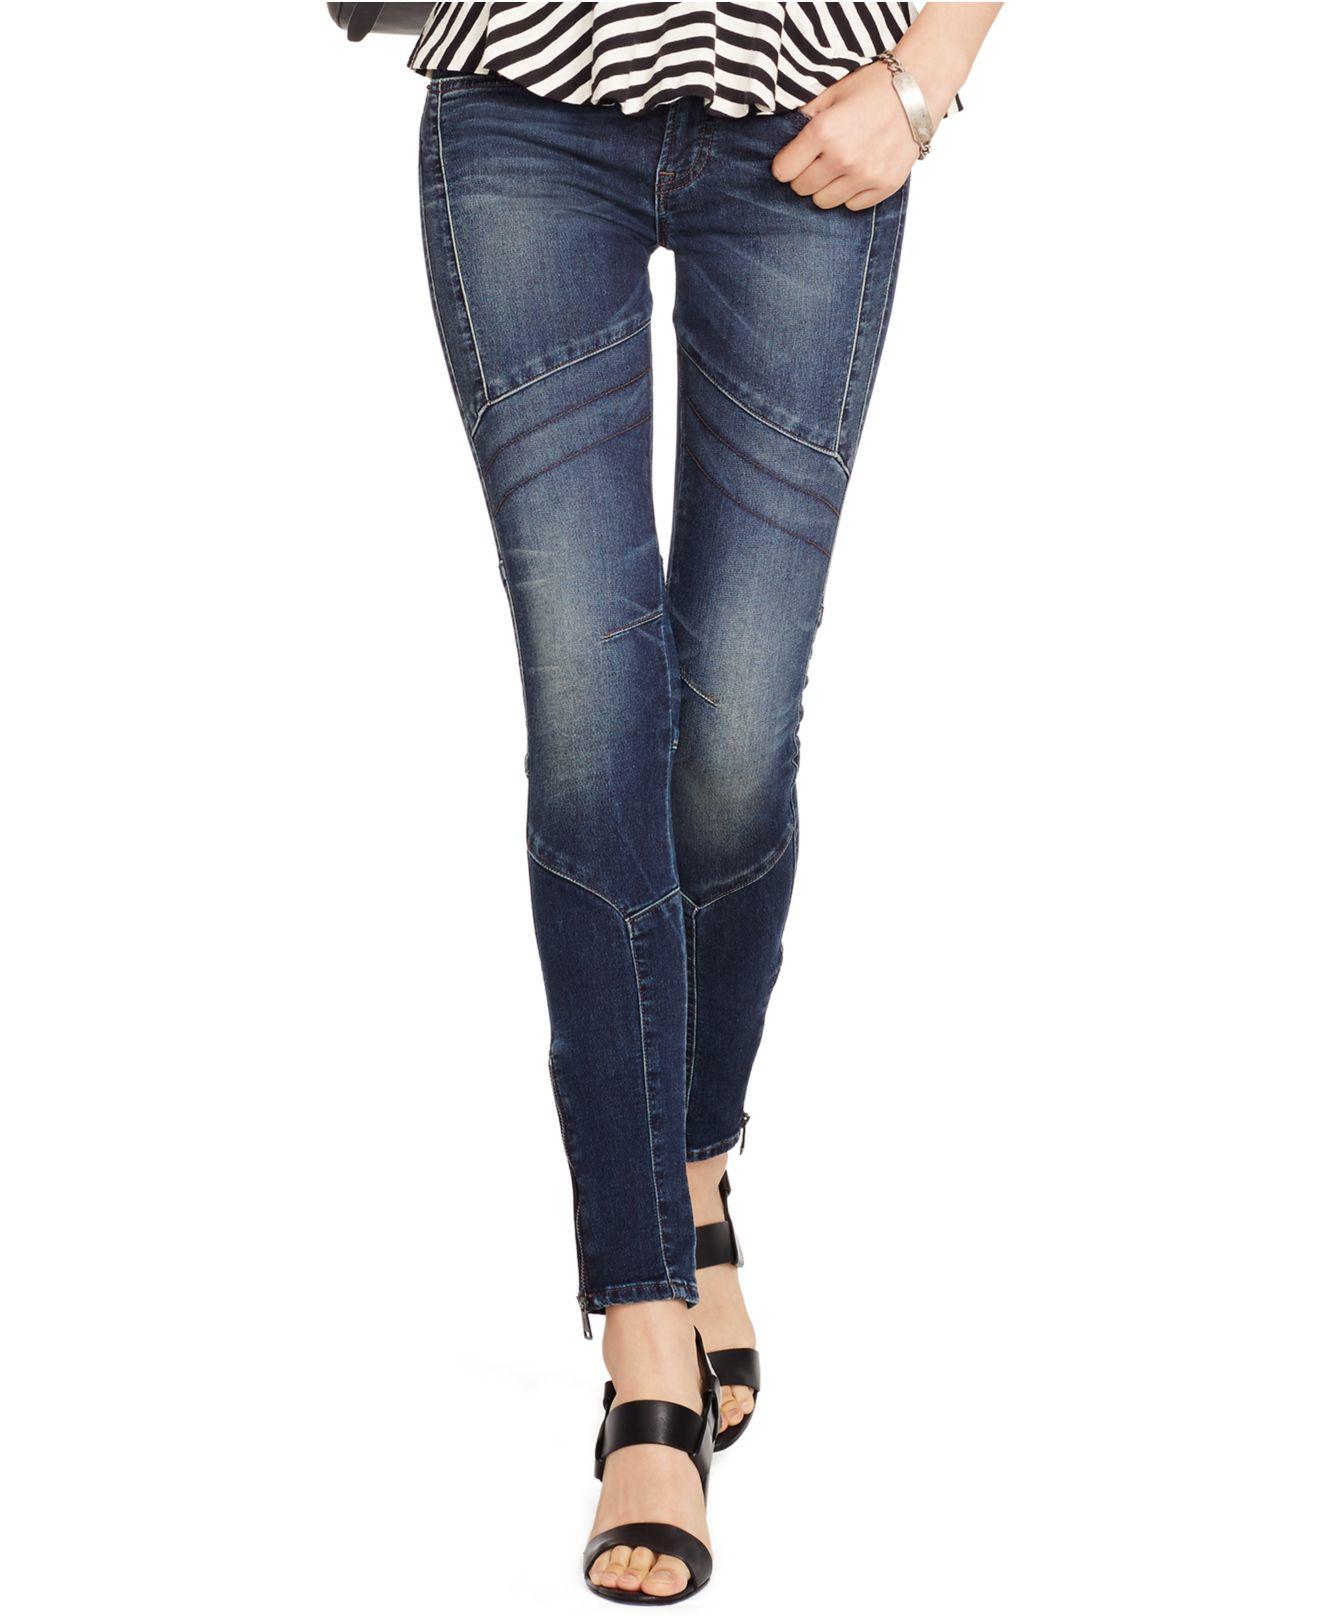 8702fbc24844 Lyst - Polo Ralph Lauren Stretch Skinny Moto Jeans in Blue